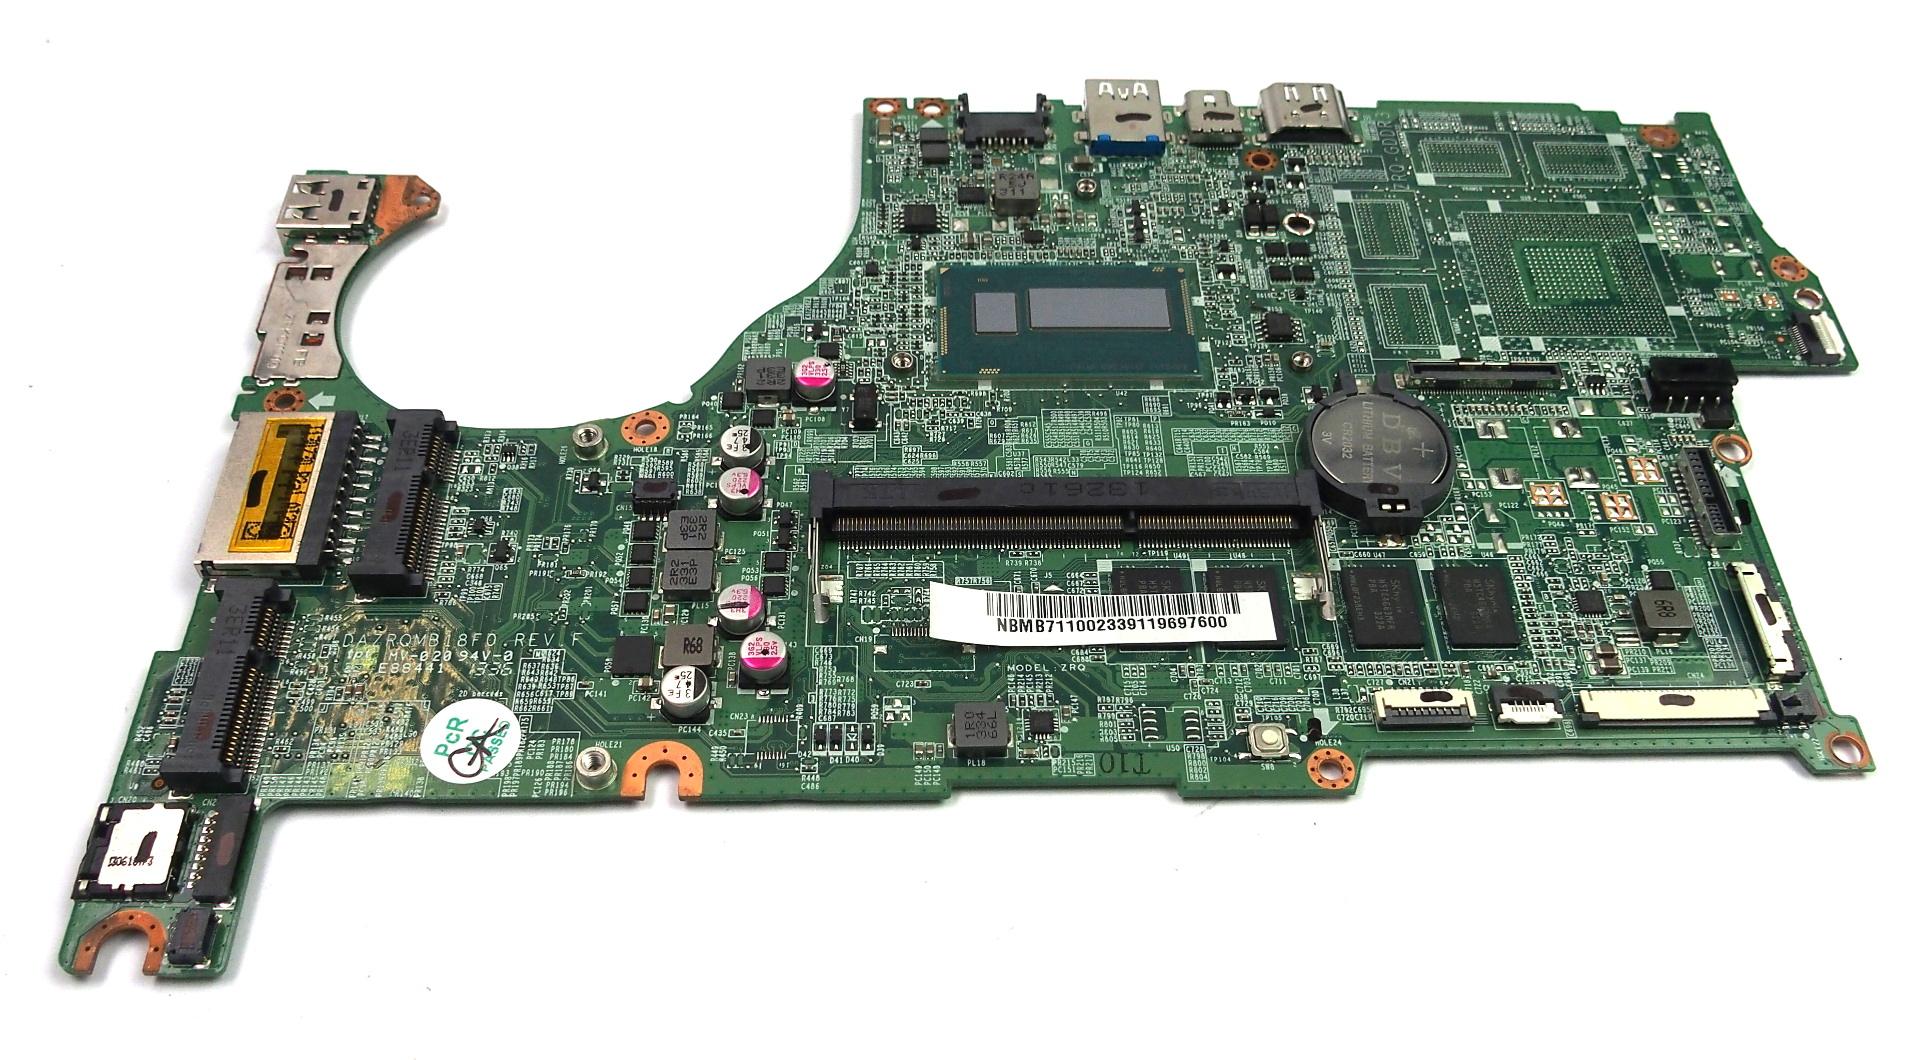 NB.MB711.002 Acer Aspire Laptop Motherboard /w BGA Core i7-4500U CPU